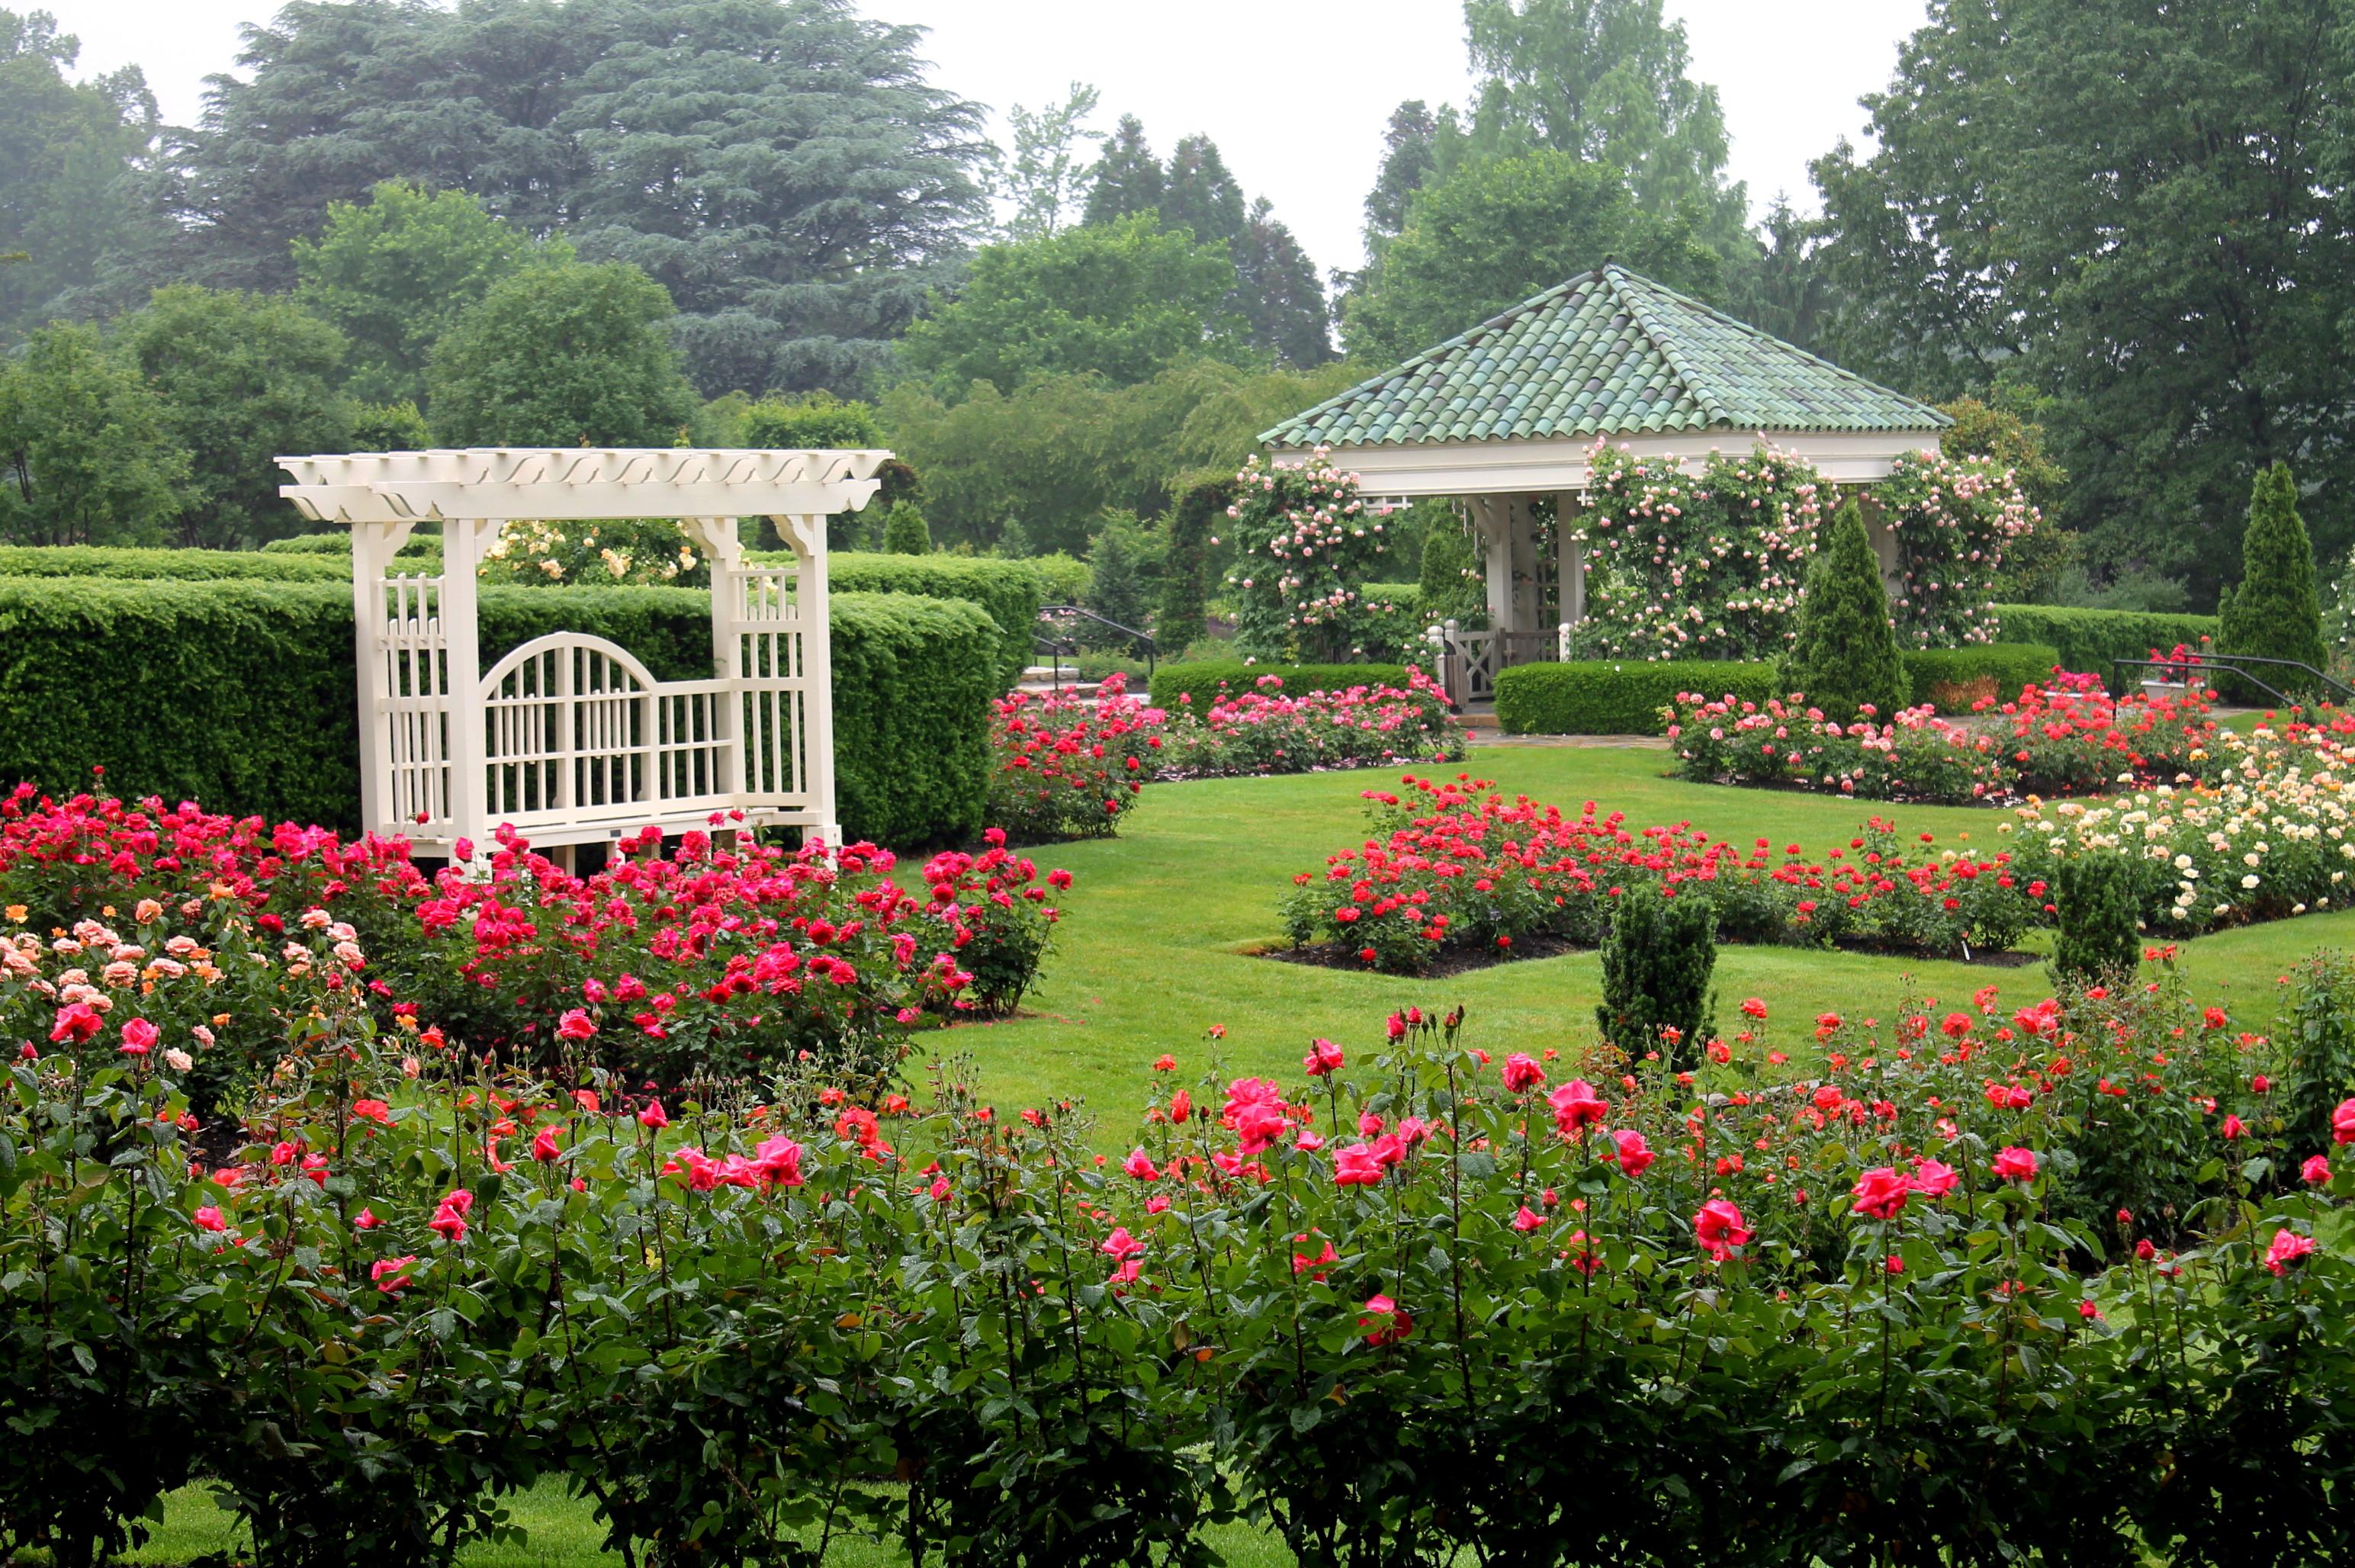 Garden sitting places garden housecalls for Landscape gardeners